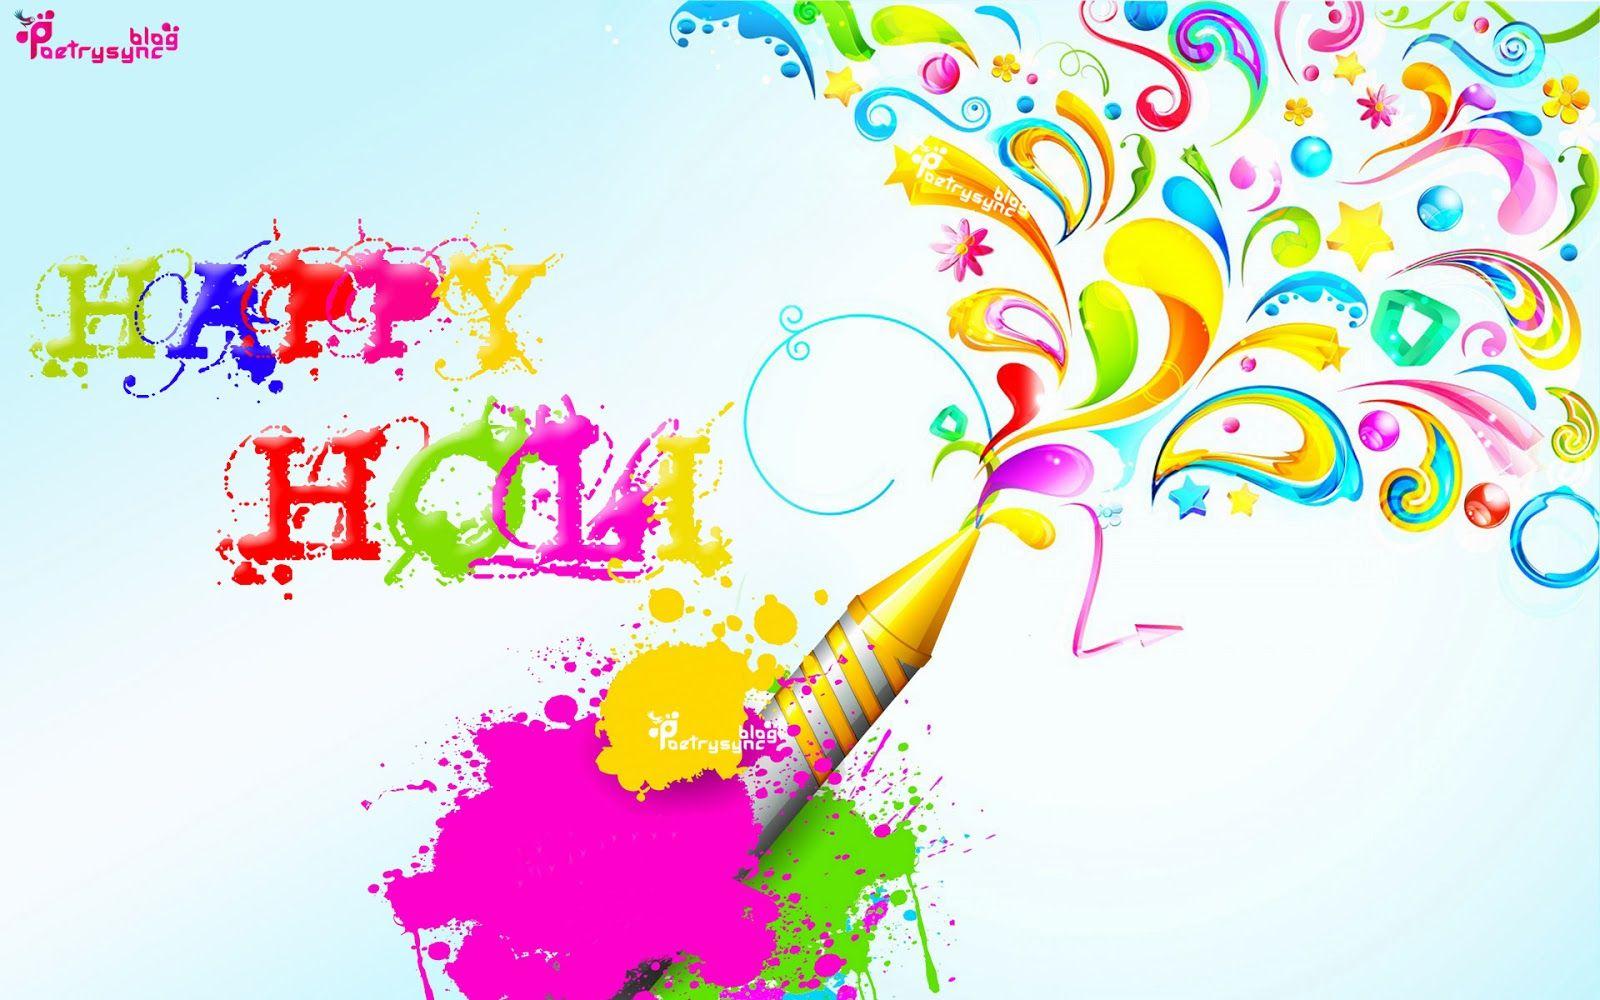 Happy holi wishes shayari card image animated swirls holi happy holi wishes shayari card image animated swirls m4hsunfo